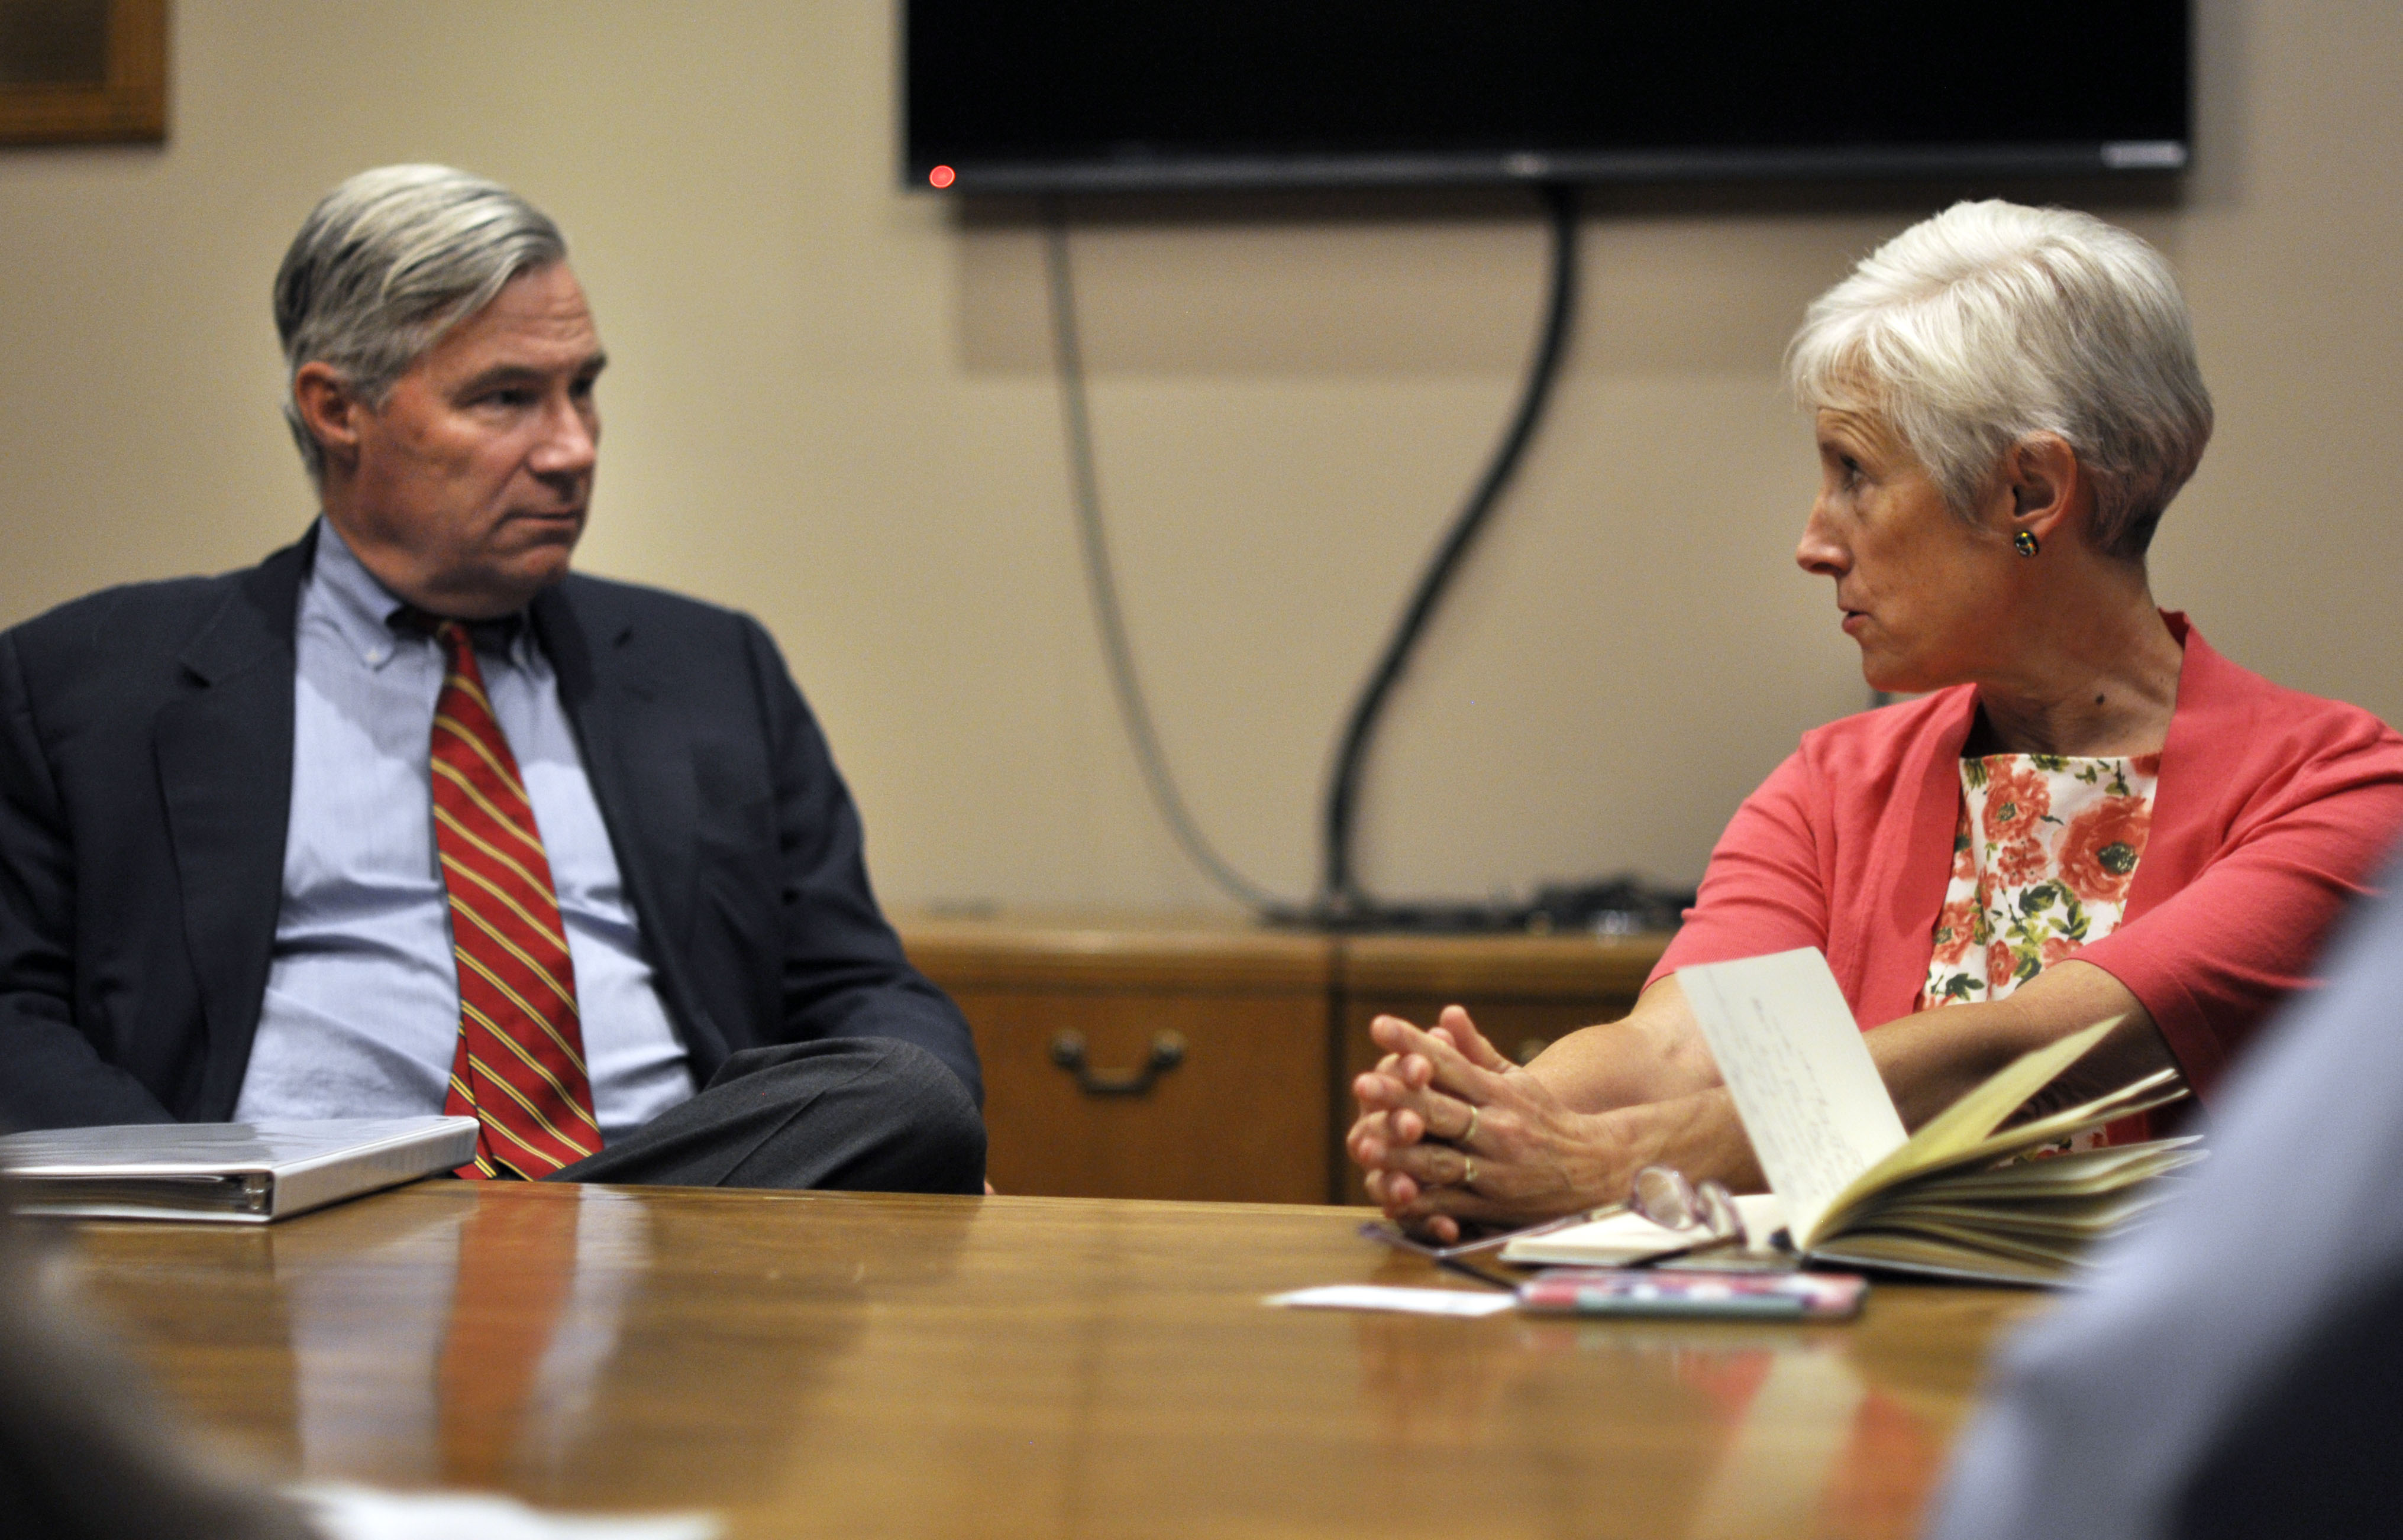 Sen. Whitehouse talks with Salt Lake City Sustainability Director Vicki Bennett